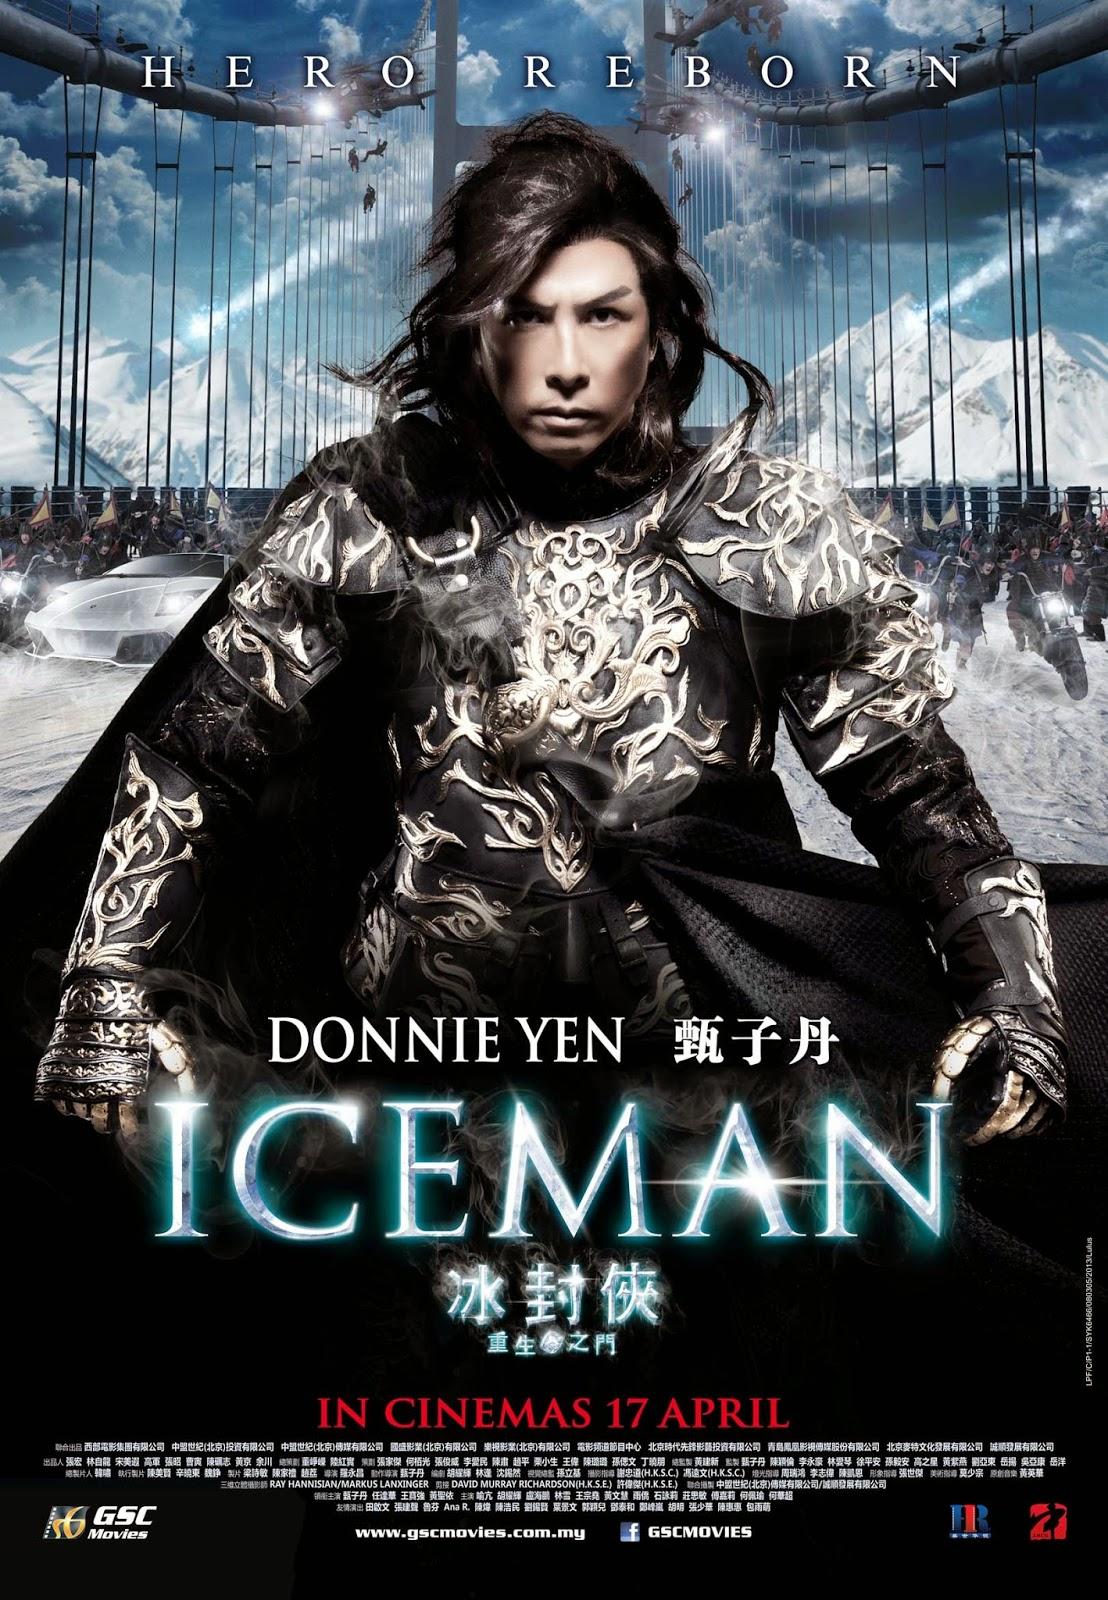 The Iceman (2014)